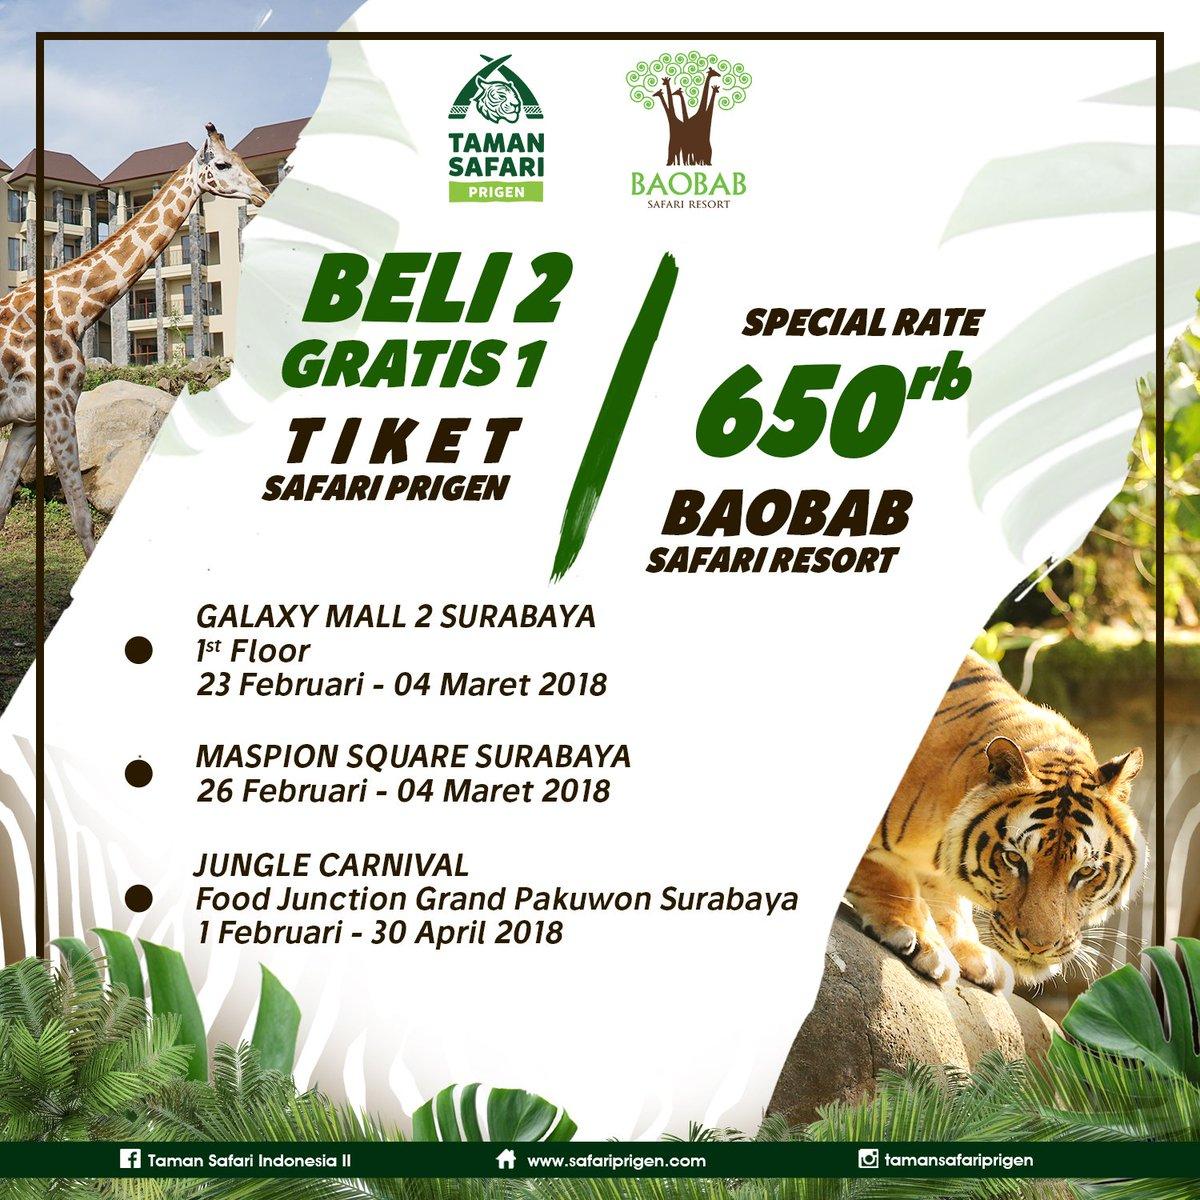 Taman Safari Prigen On Twitter Promo Tiket Masuk Taman Safari